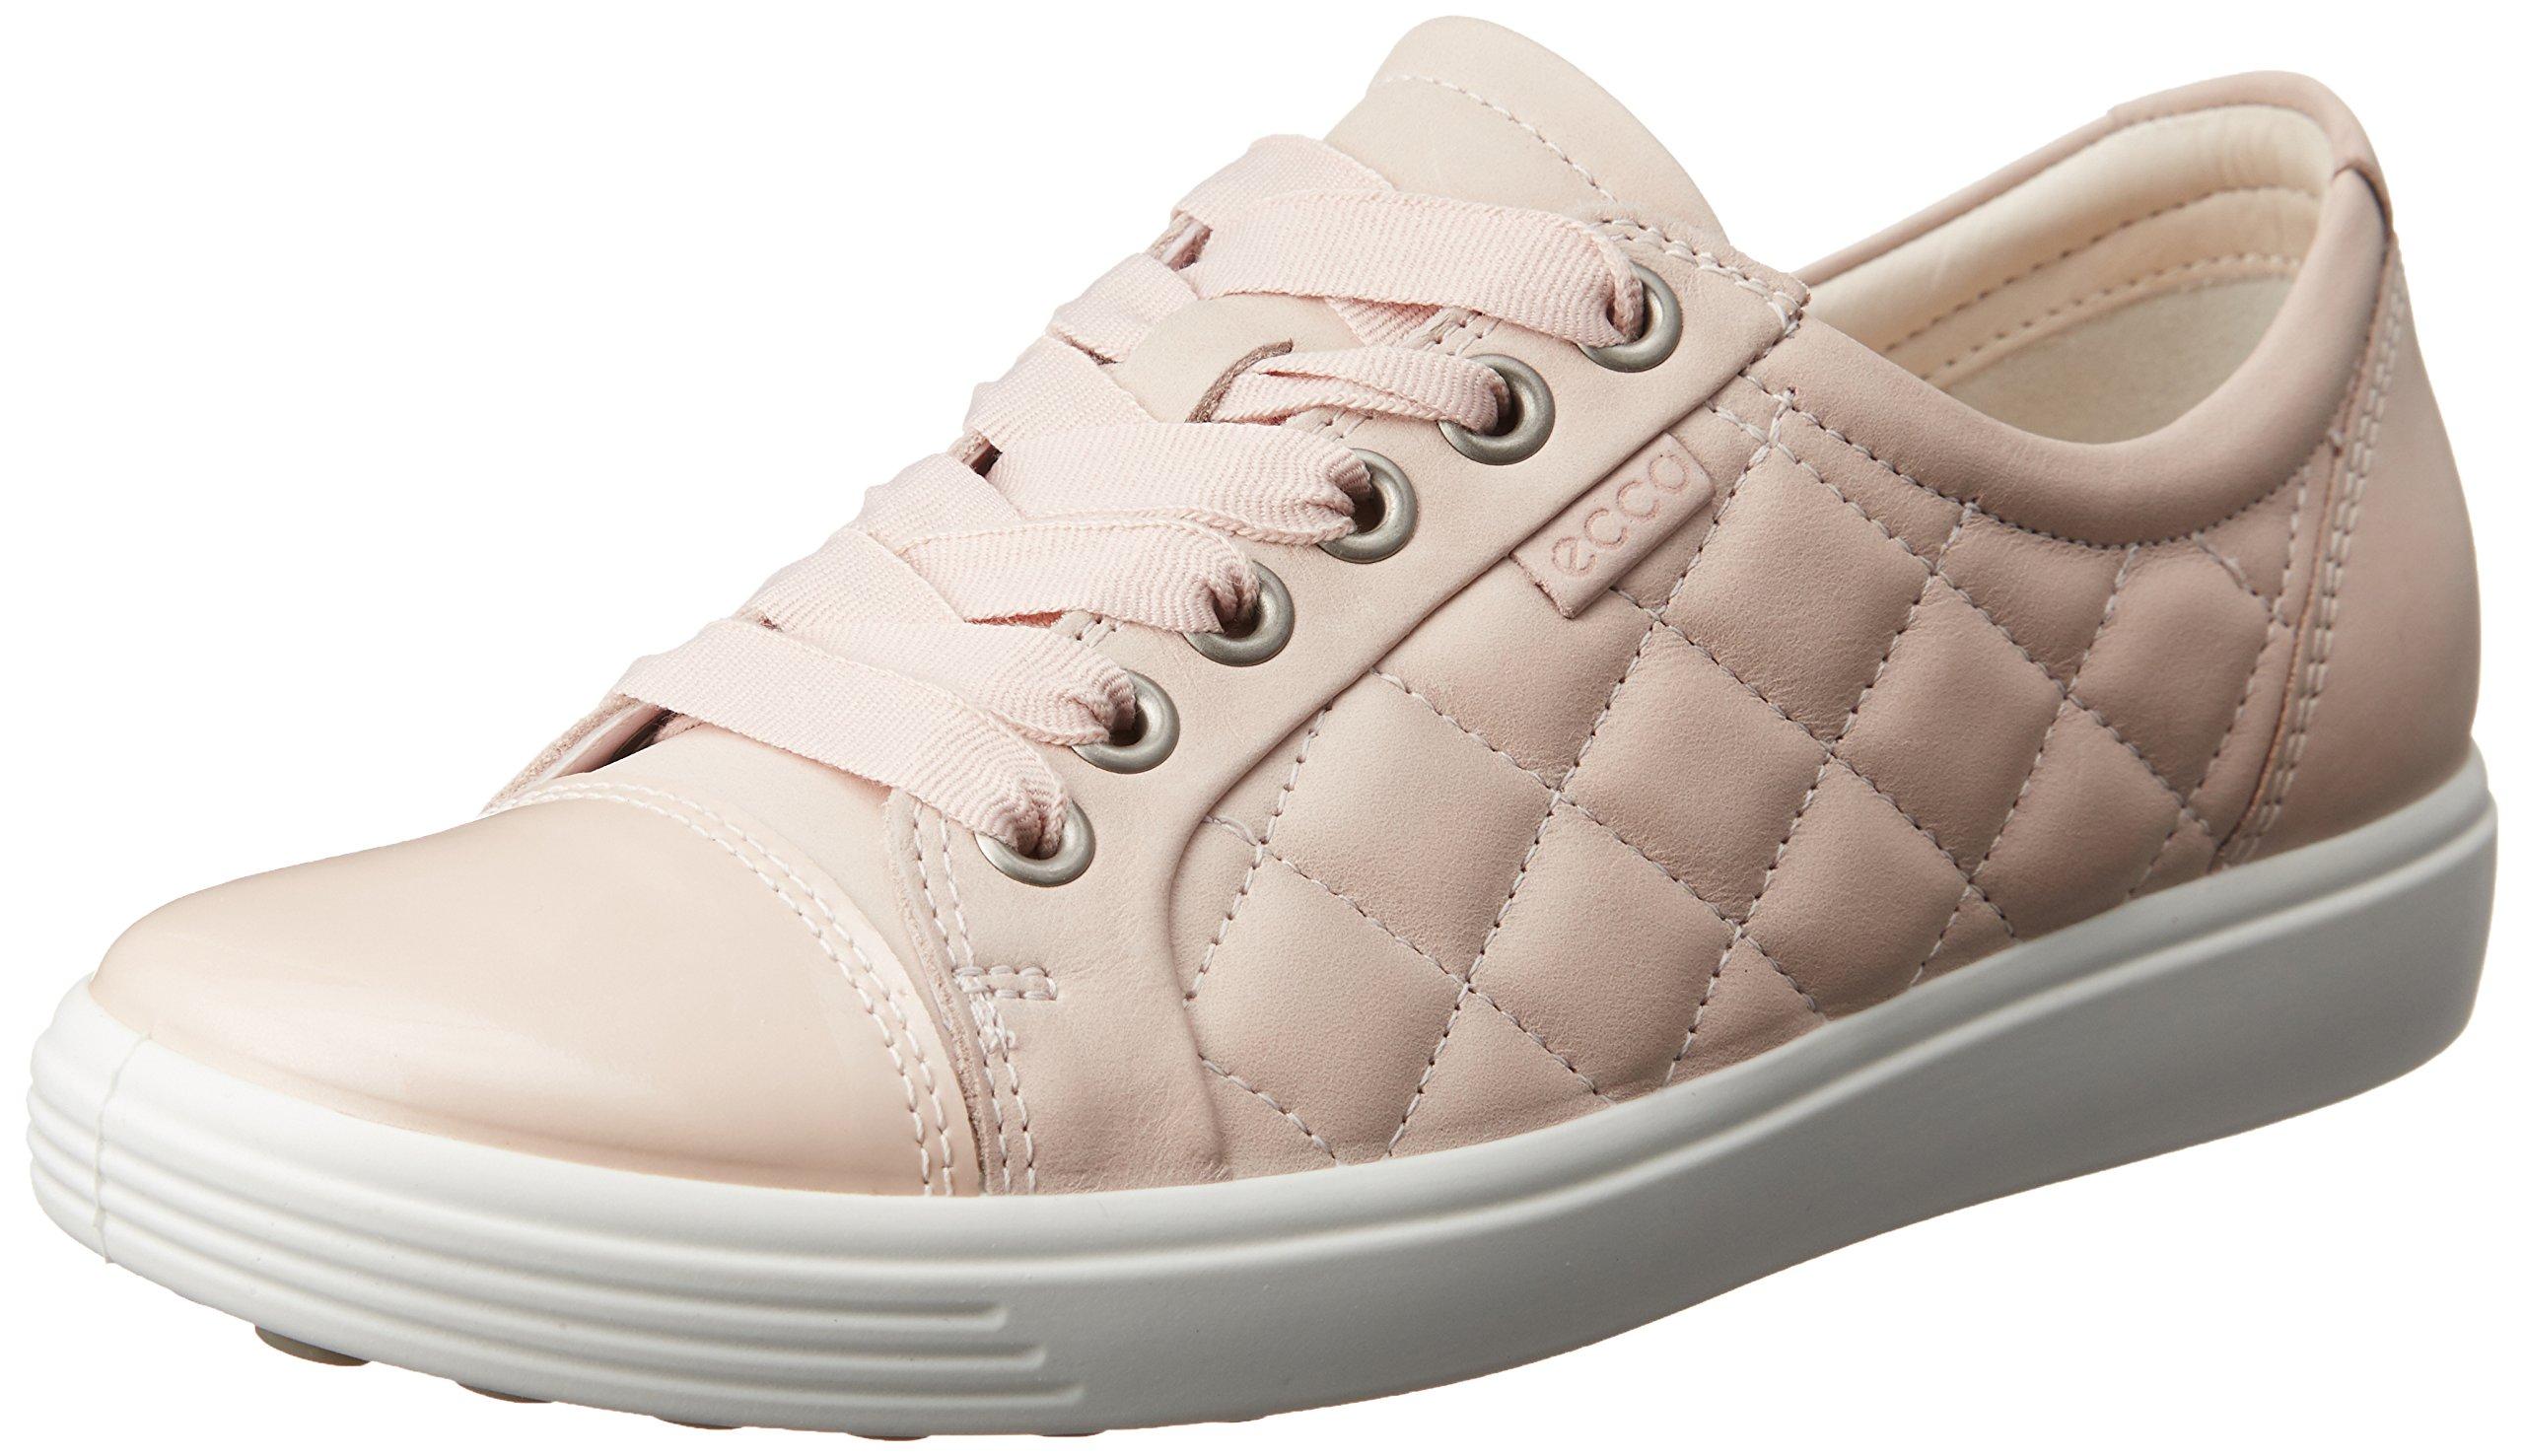 ECCO Women's Women's Soft 7 Quilted Tie Fashion Sneaker, Rose Dust/Rose Dust, 39 EU/8-8.5 M US